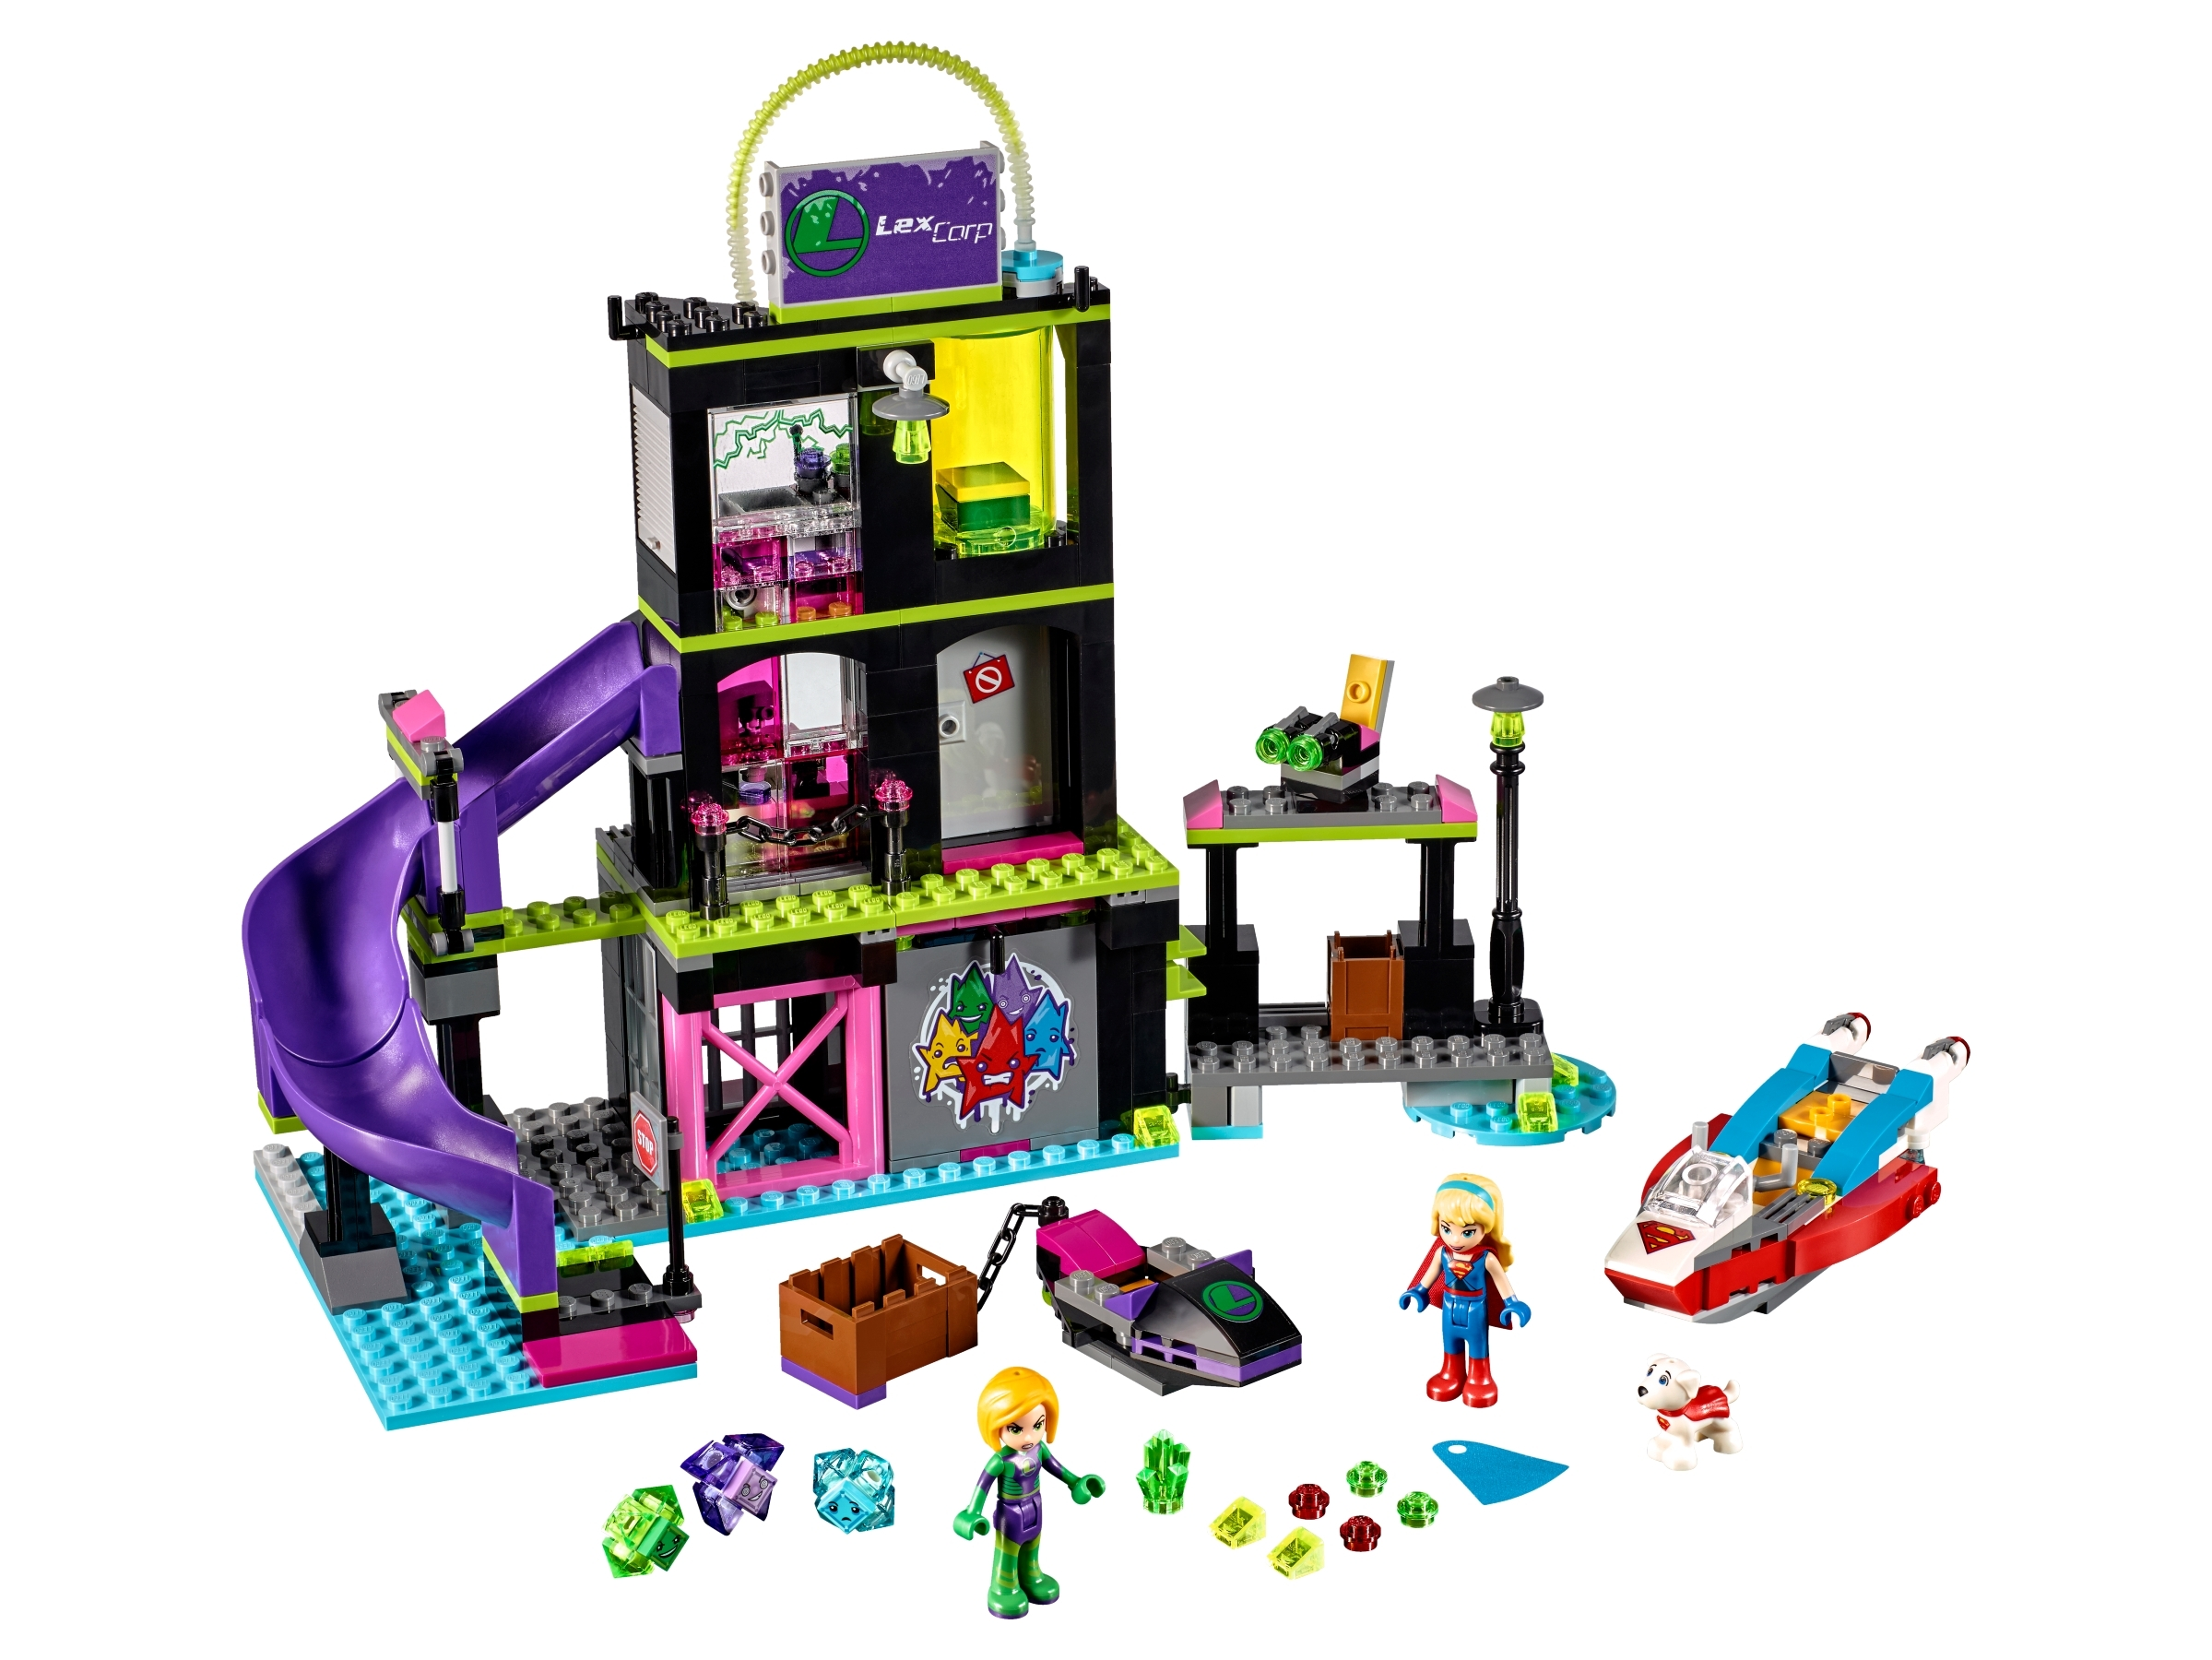 Female Scientist NEUF NEW LEGO City Minifigure CTY0848 Femme Scientifique